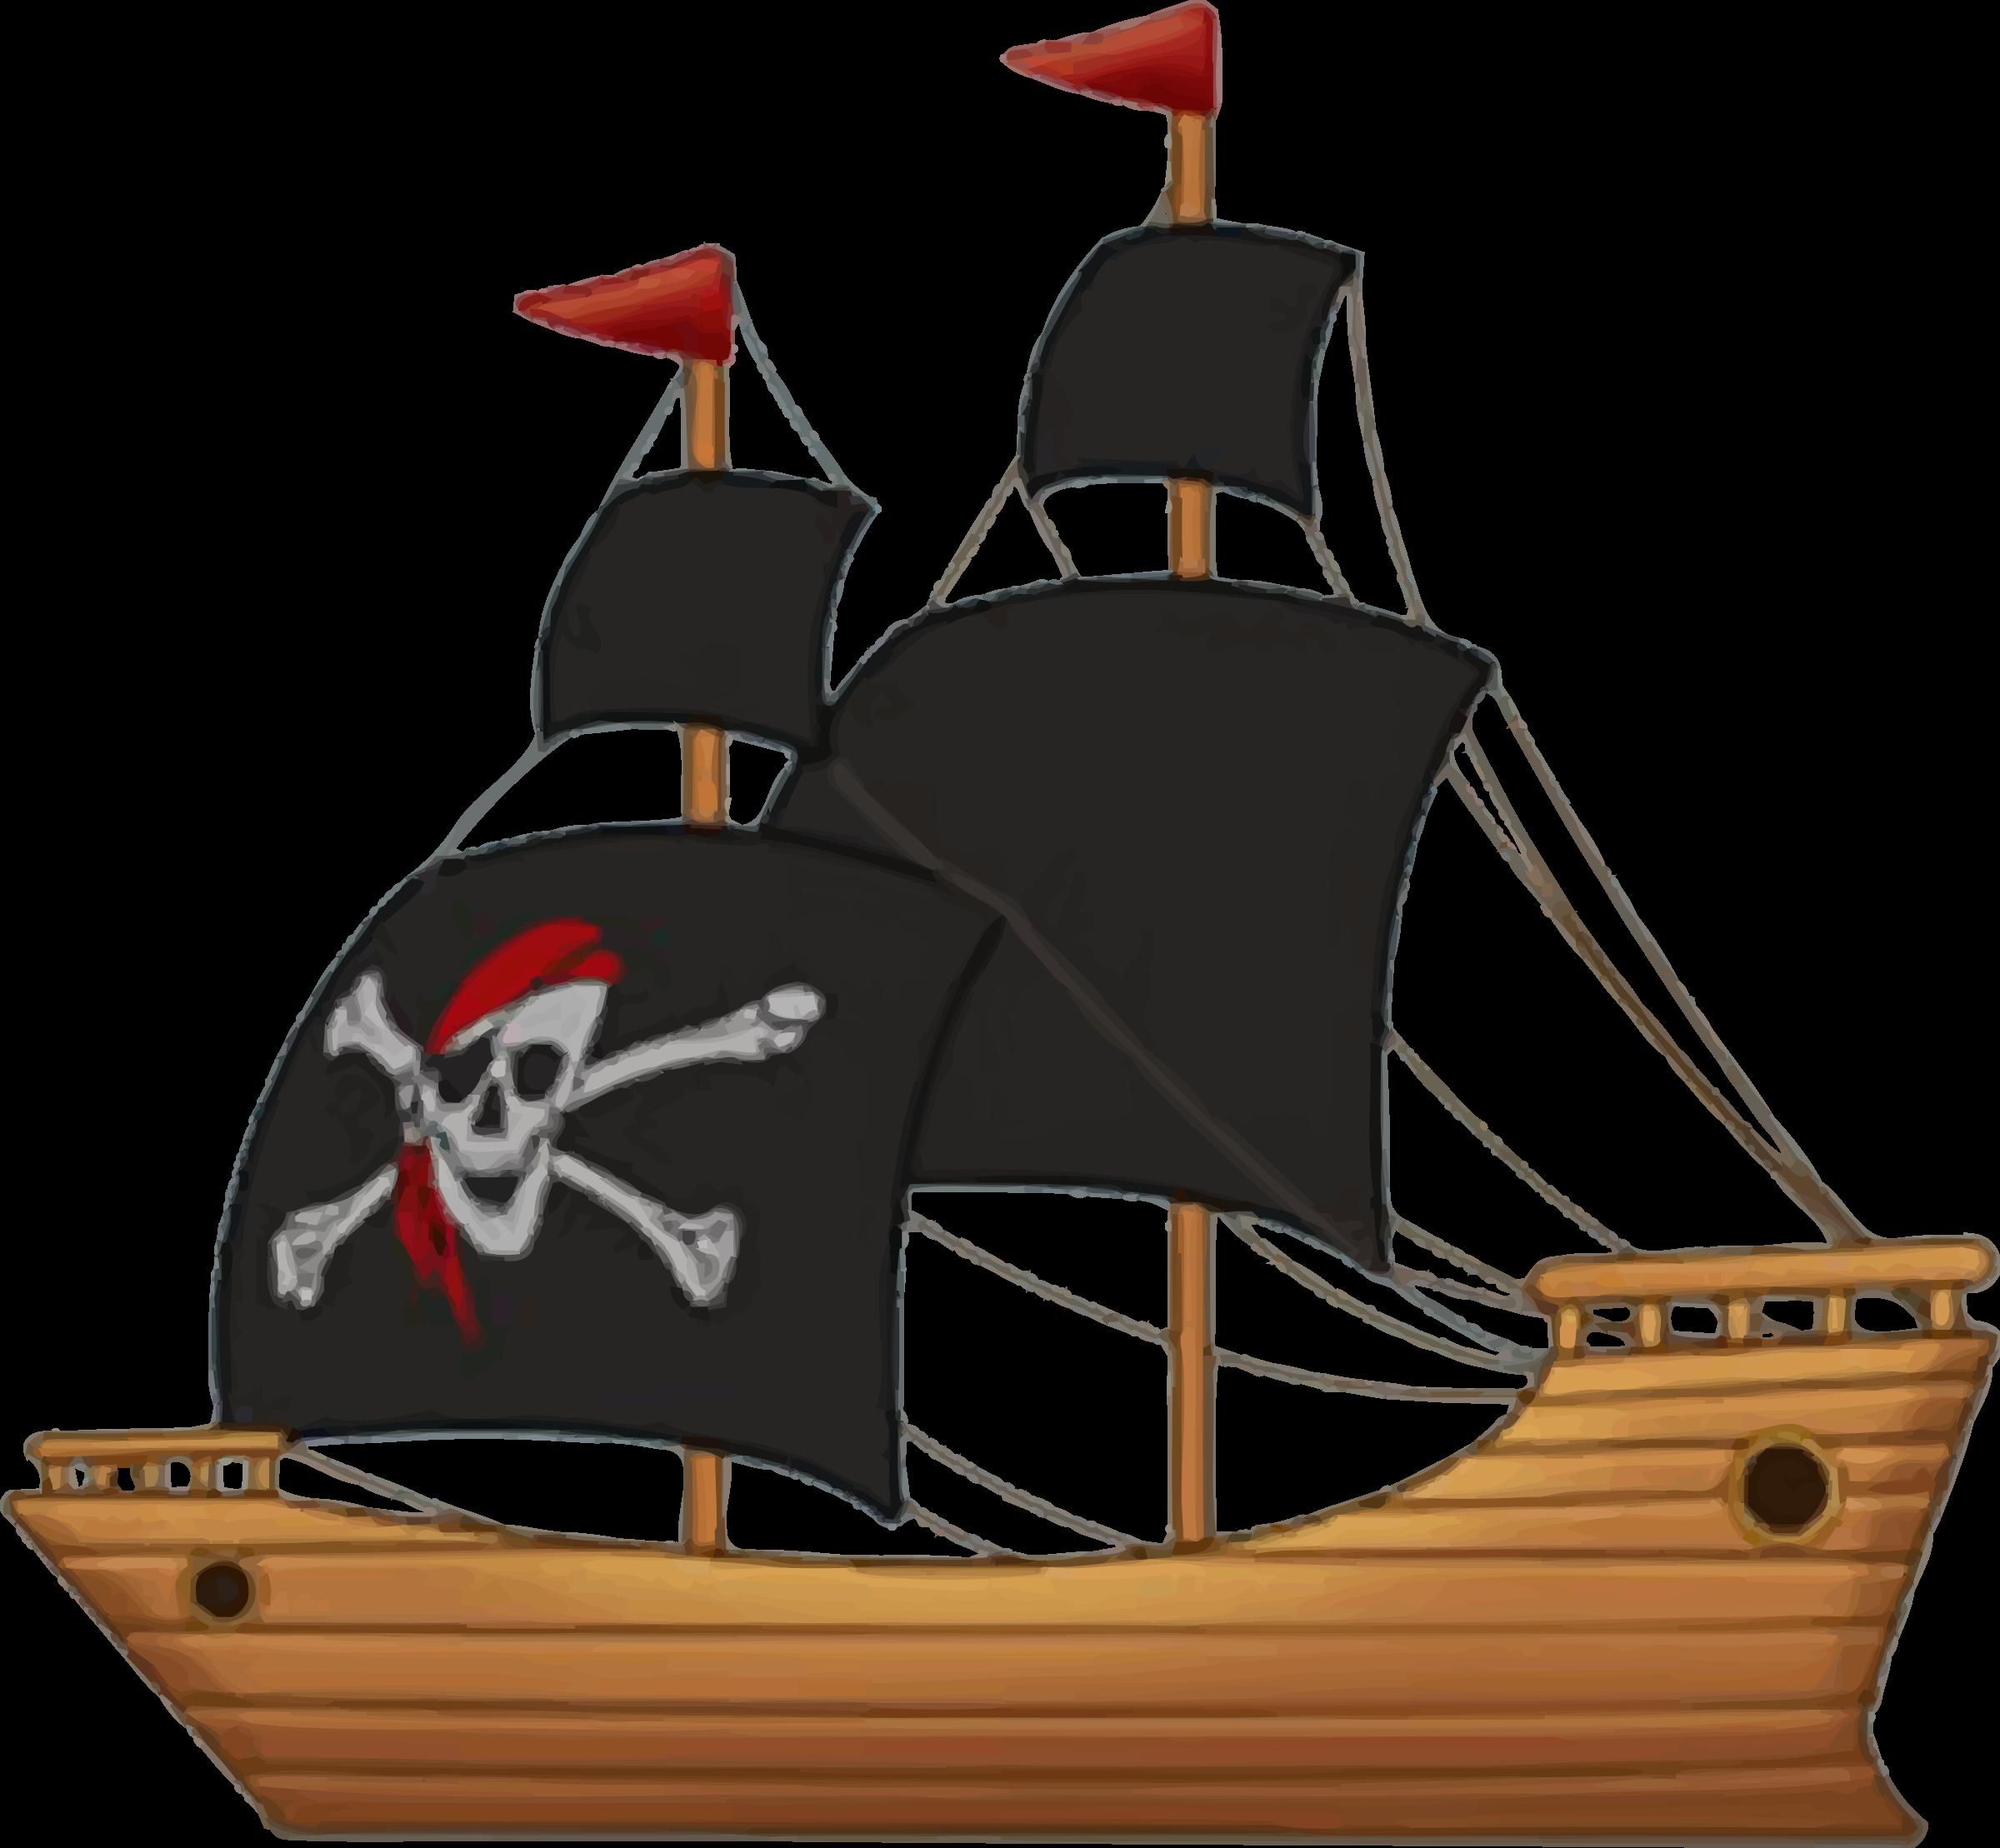 free stock Boat pirate ship pencil. Boats clipart tanker